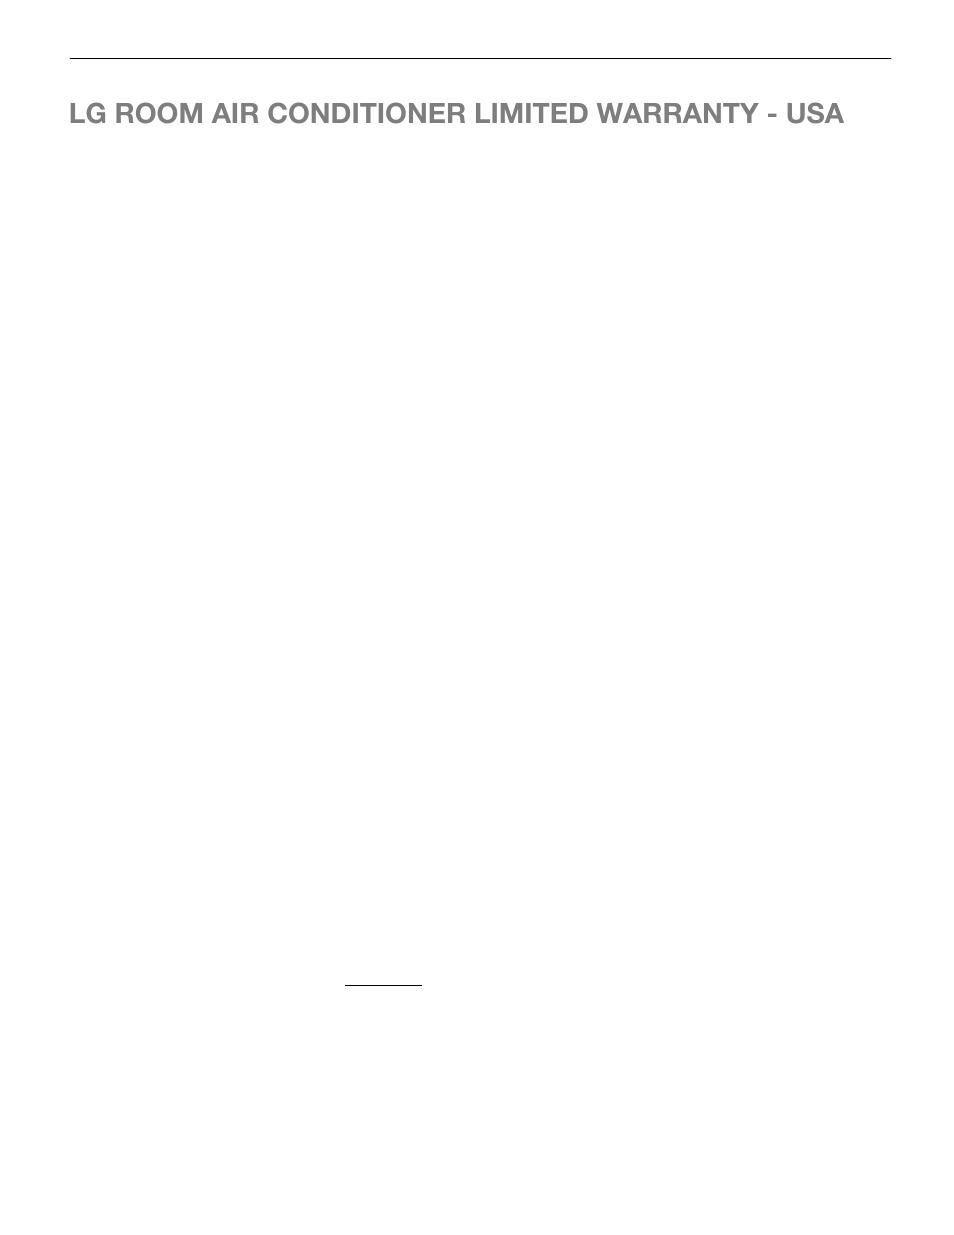 Lg room air conditioner limited warranty - usa, Warranty | LG LW5014 User  Manual |